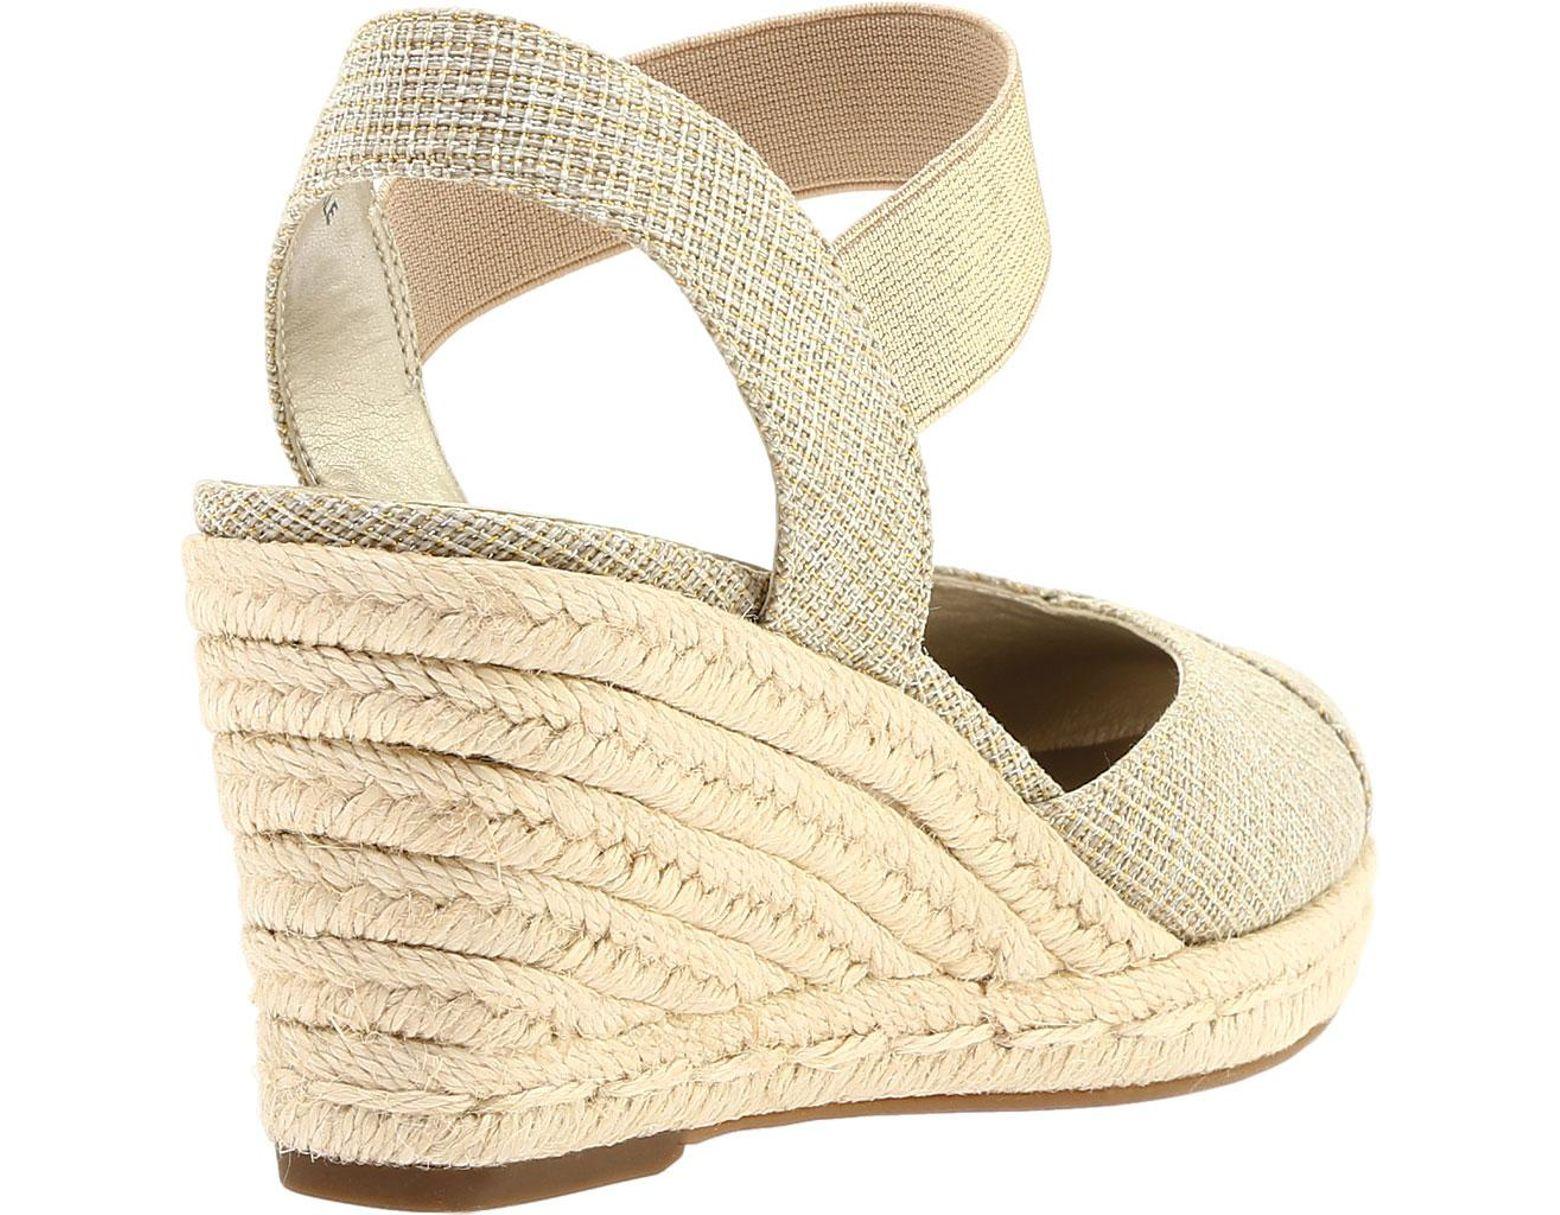 4dff005a4d7 Anne Klein Acer Closed Toe Sandal in Metallic - Lyst